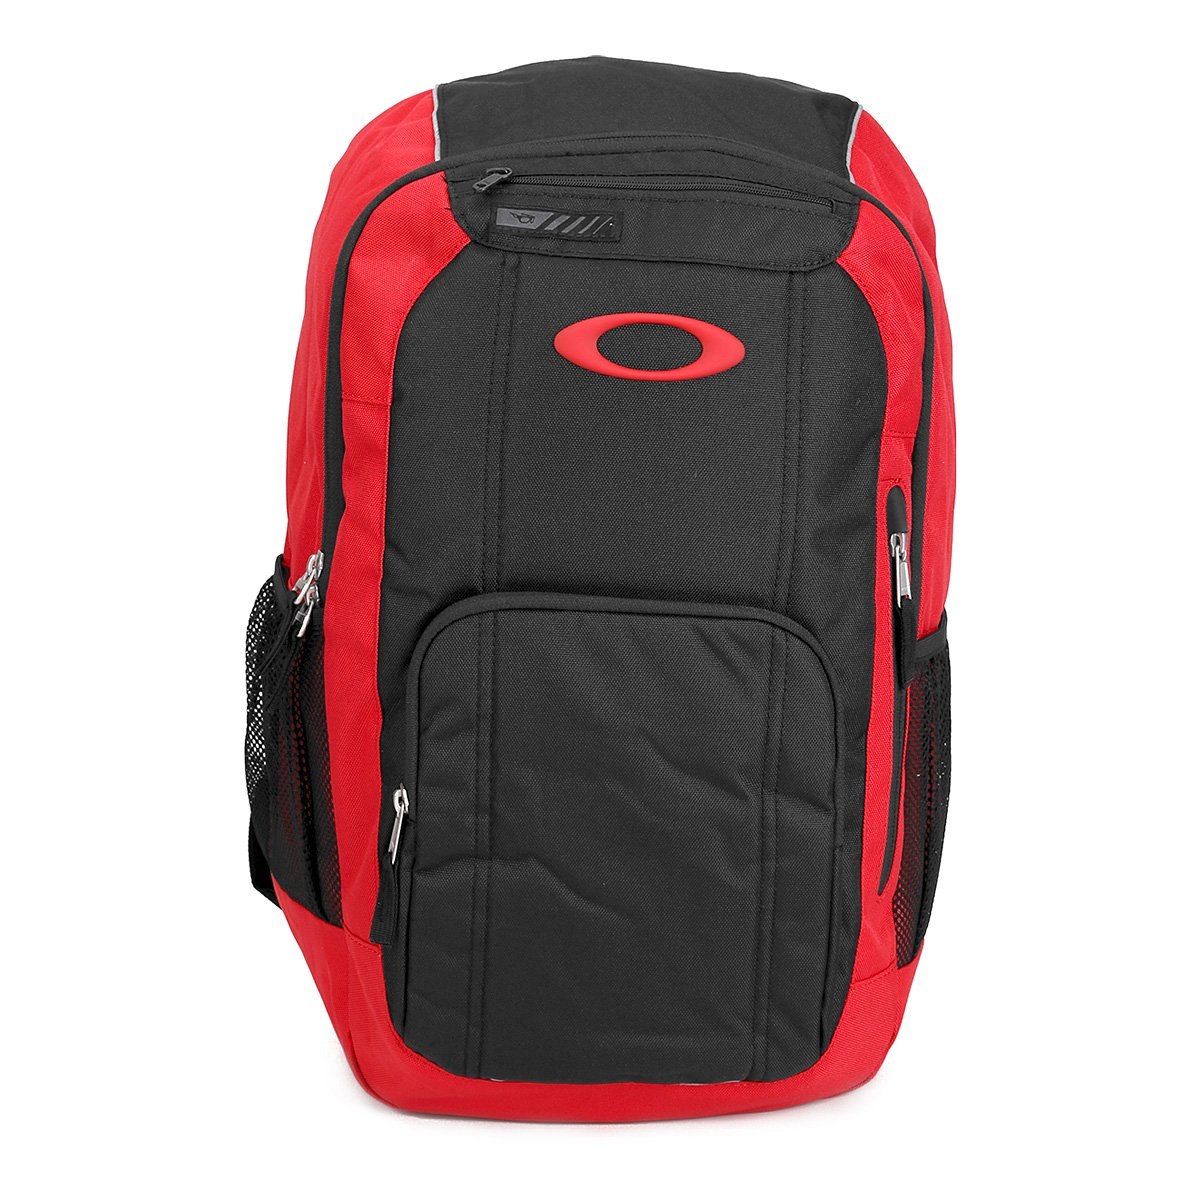 99803701272ad Mochila Oakley Enduro 25L 2.0 Masculina - Vermelho - Compre Agora ...